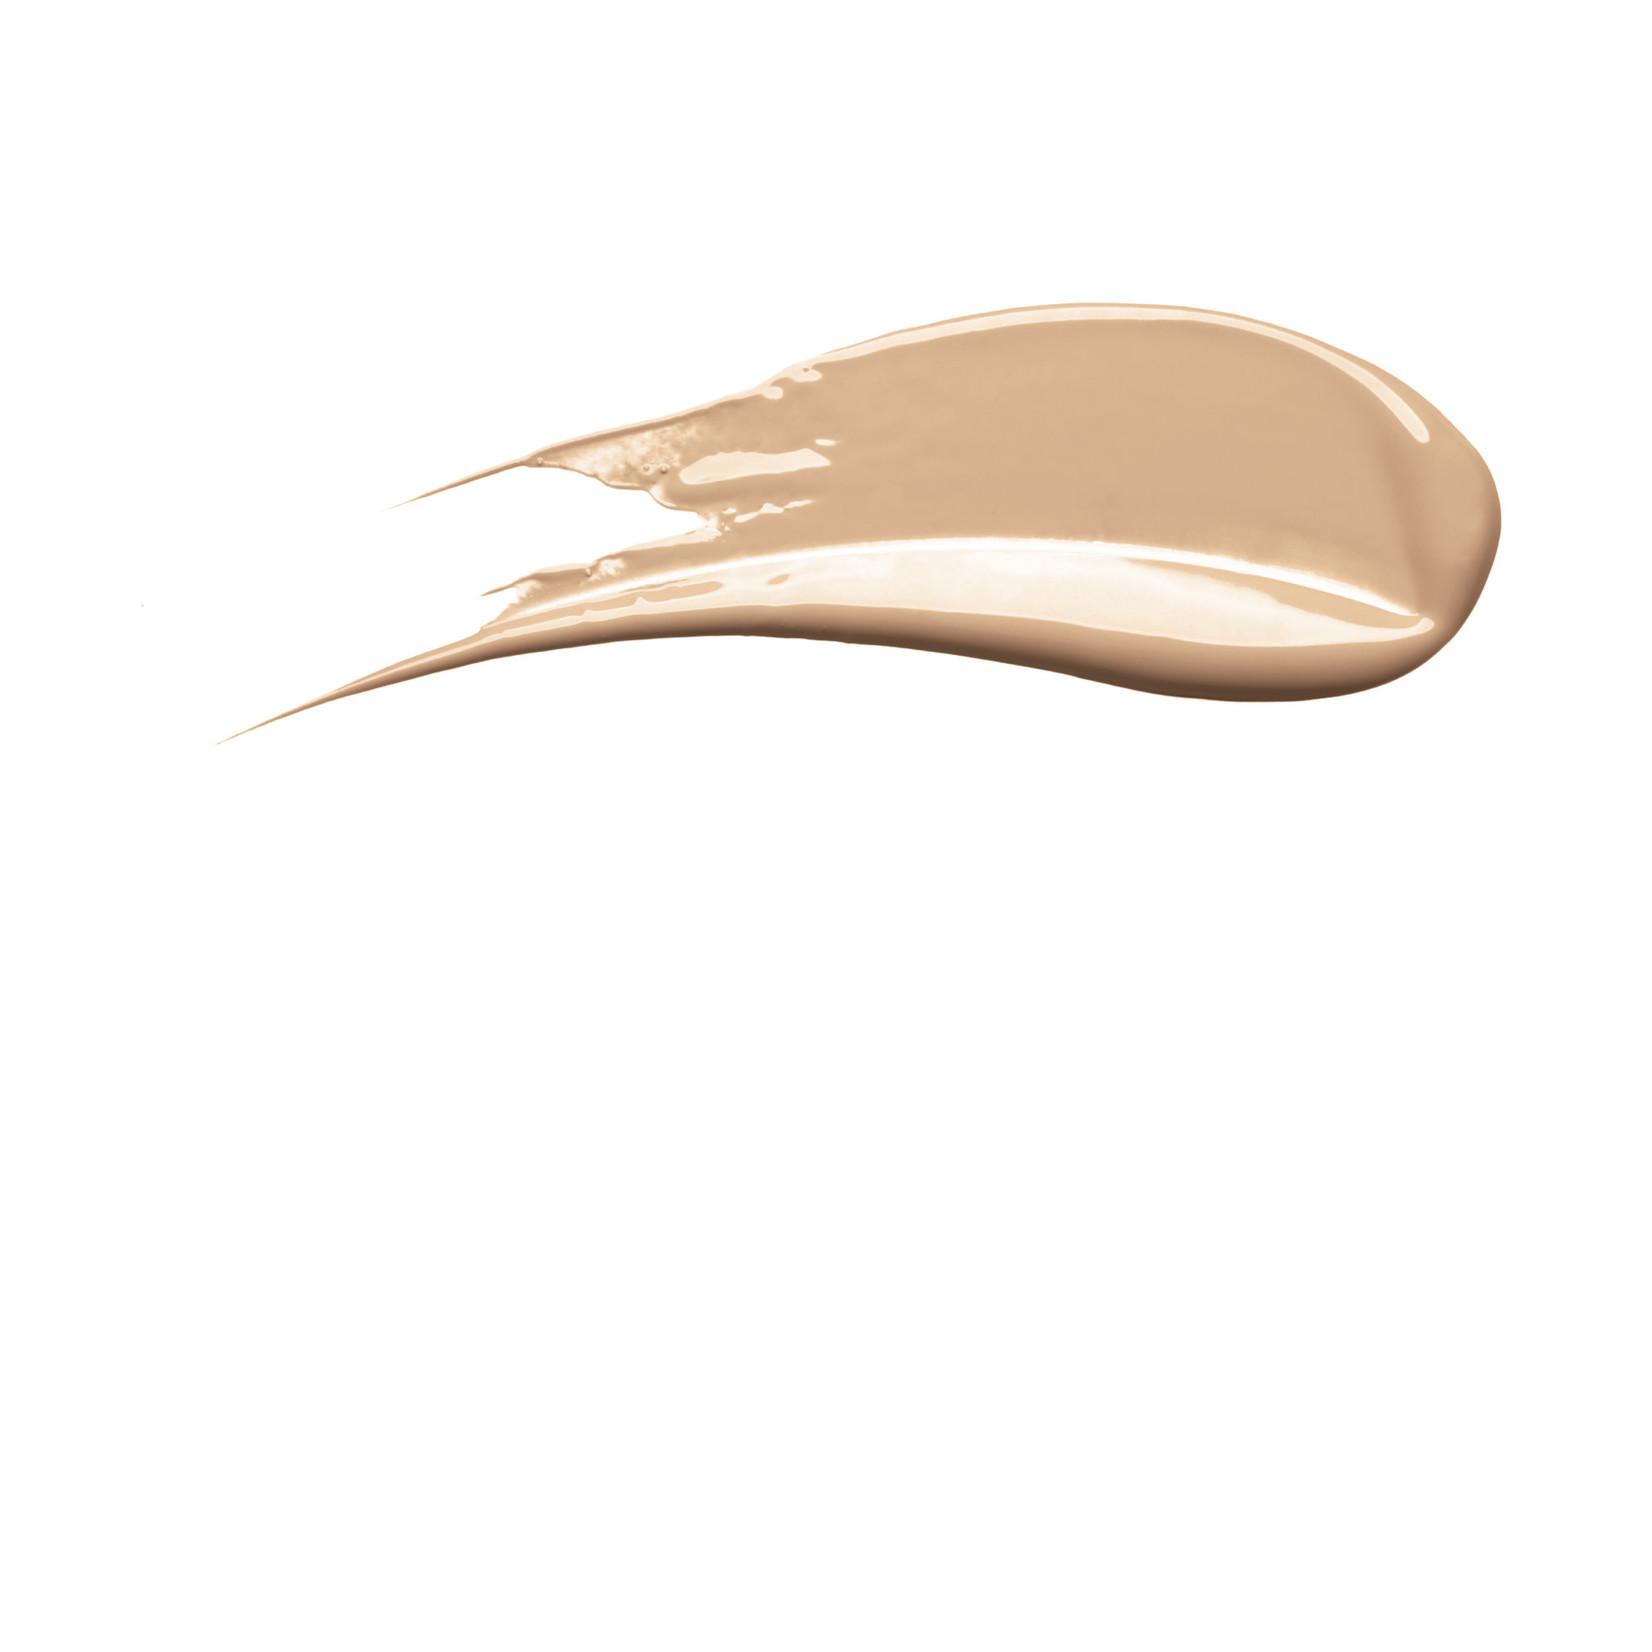 Glo Skin Beauty Satin Cream Foundation